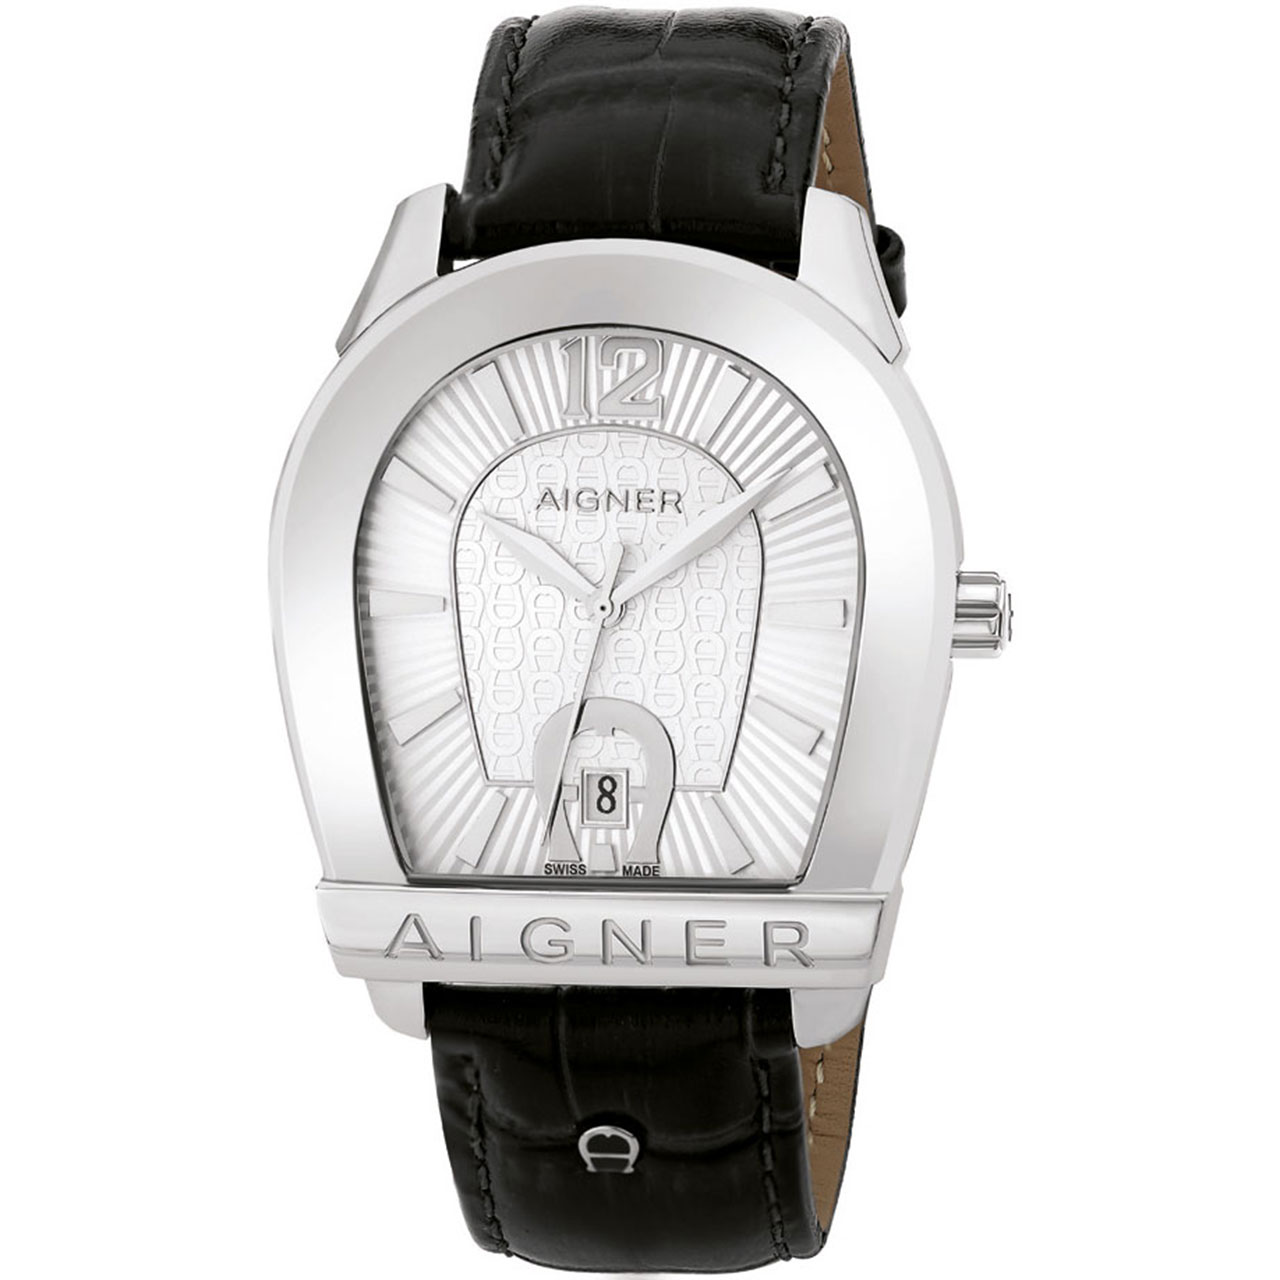 ساعت مچی عقربه ای مردانه اگنر مدل A101005